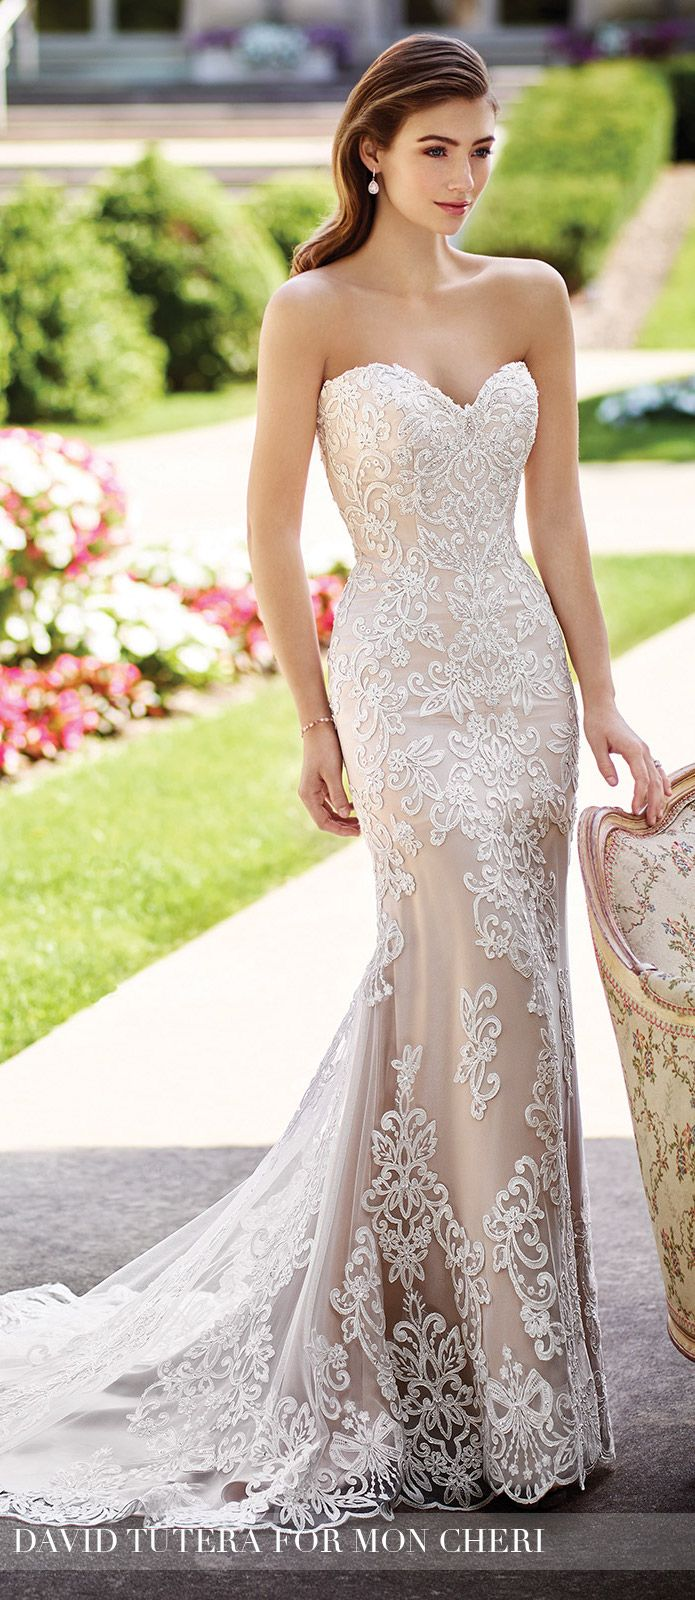 Wedding Dress by David Tutera for Mon Cheri 2017 Bridal Collection | Style No. » 117290 Roxanne